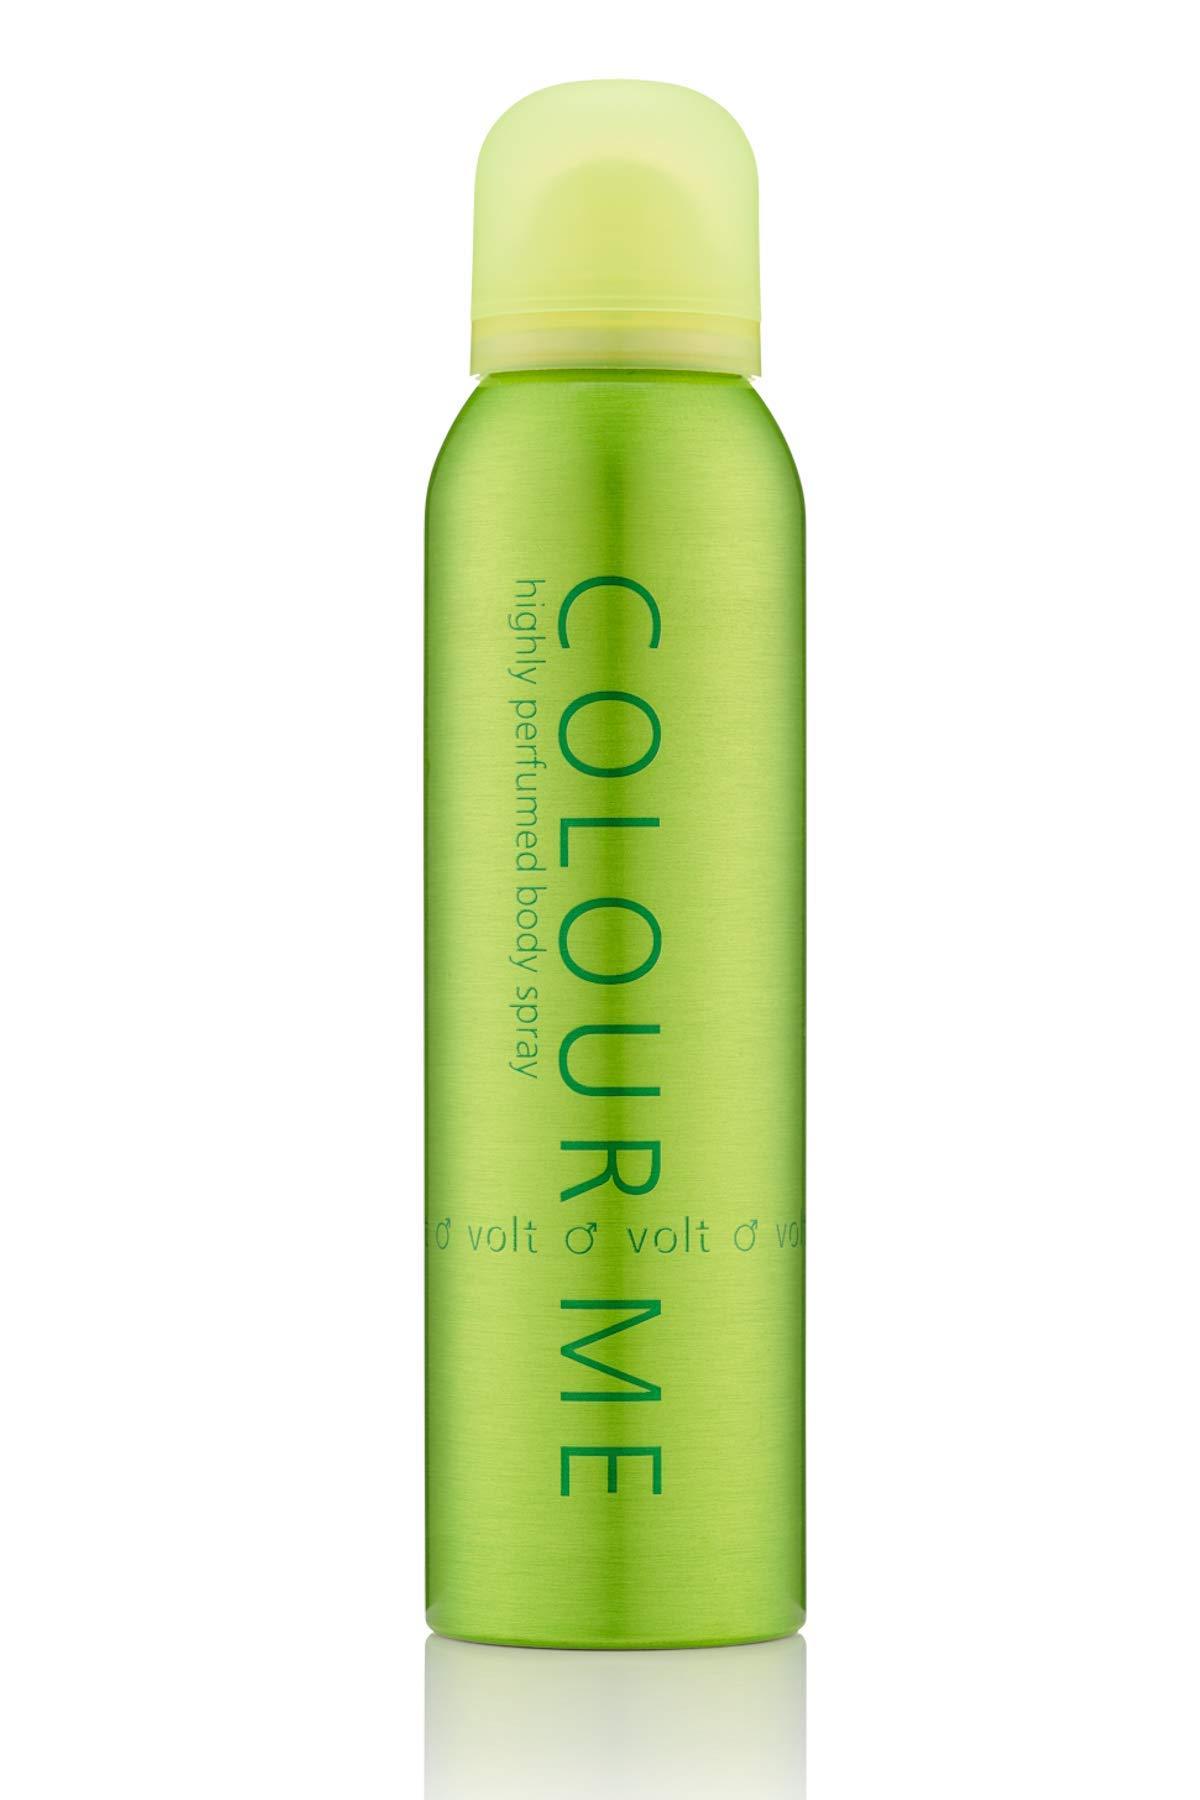 Colour Me Volt - Fragrance for Men - 150ml Body Spray, by Milton-Lloyd